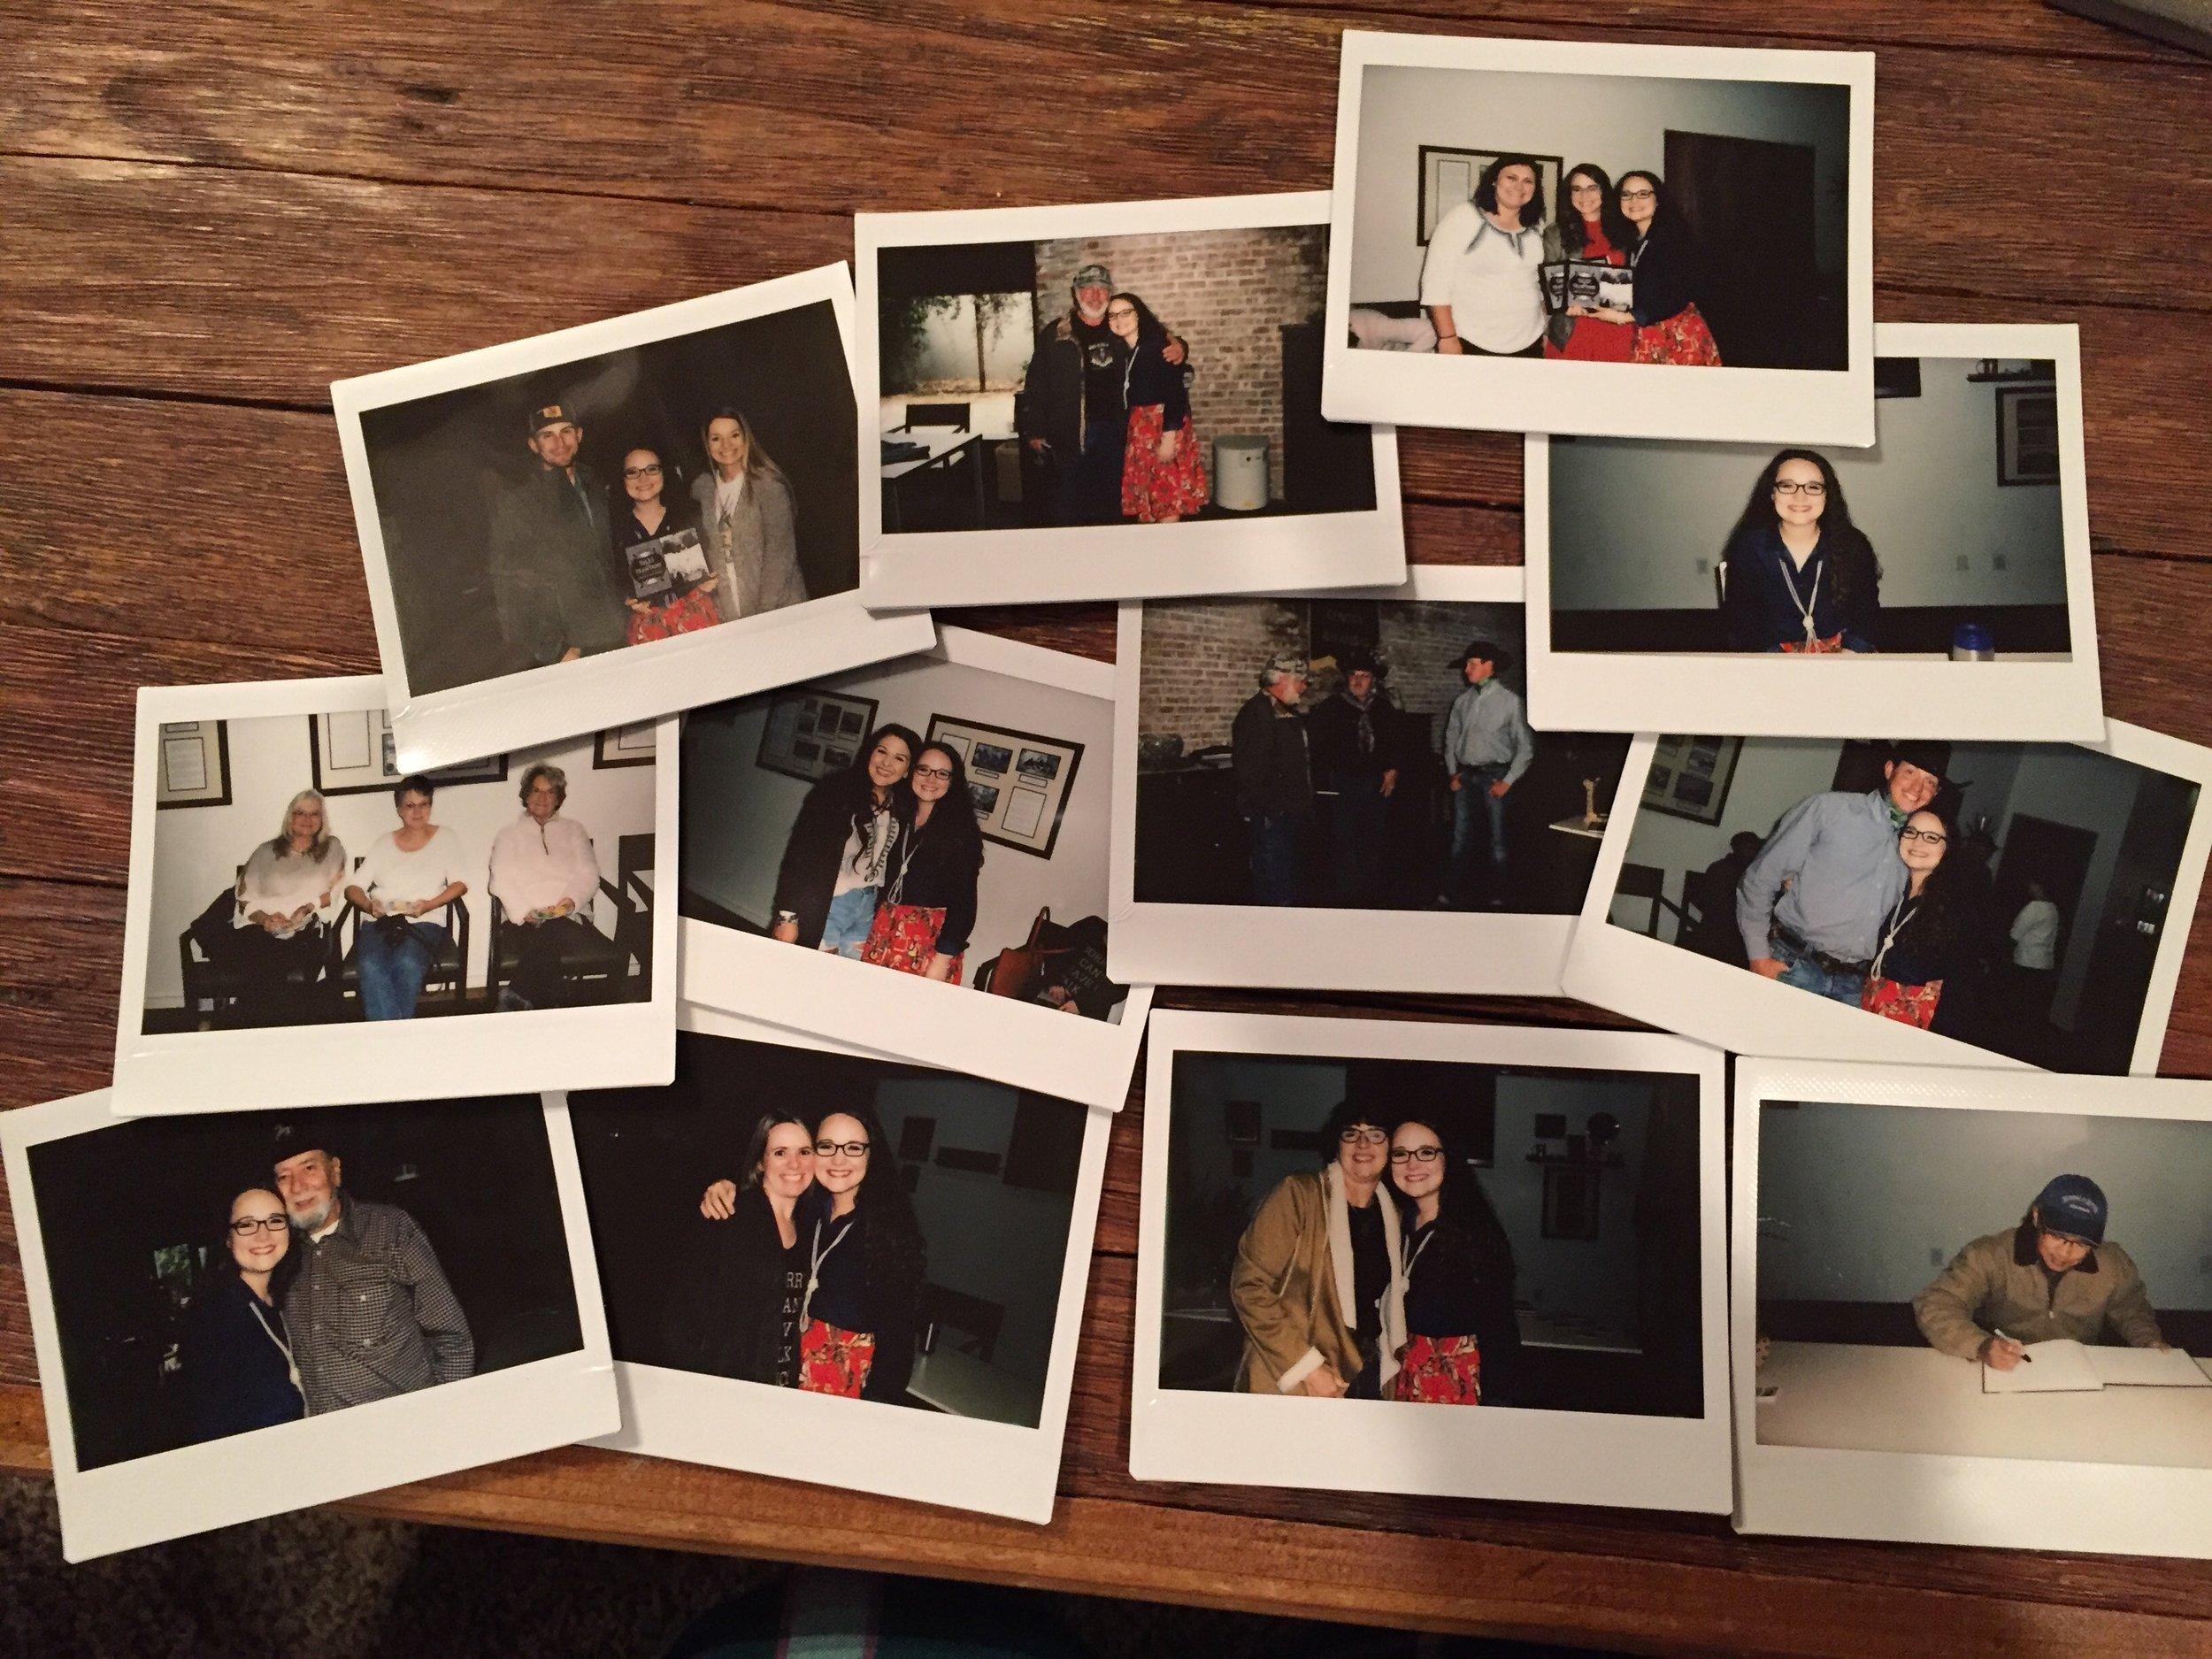 Polaroids are my jam